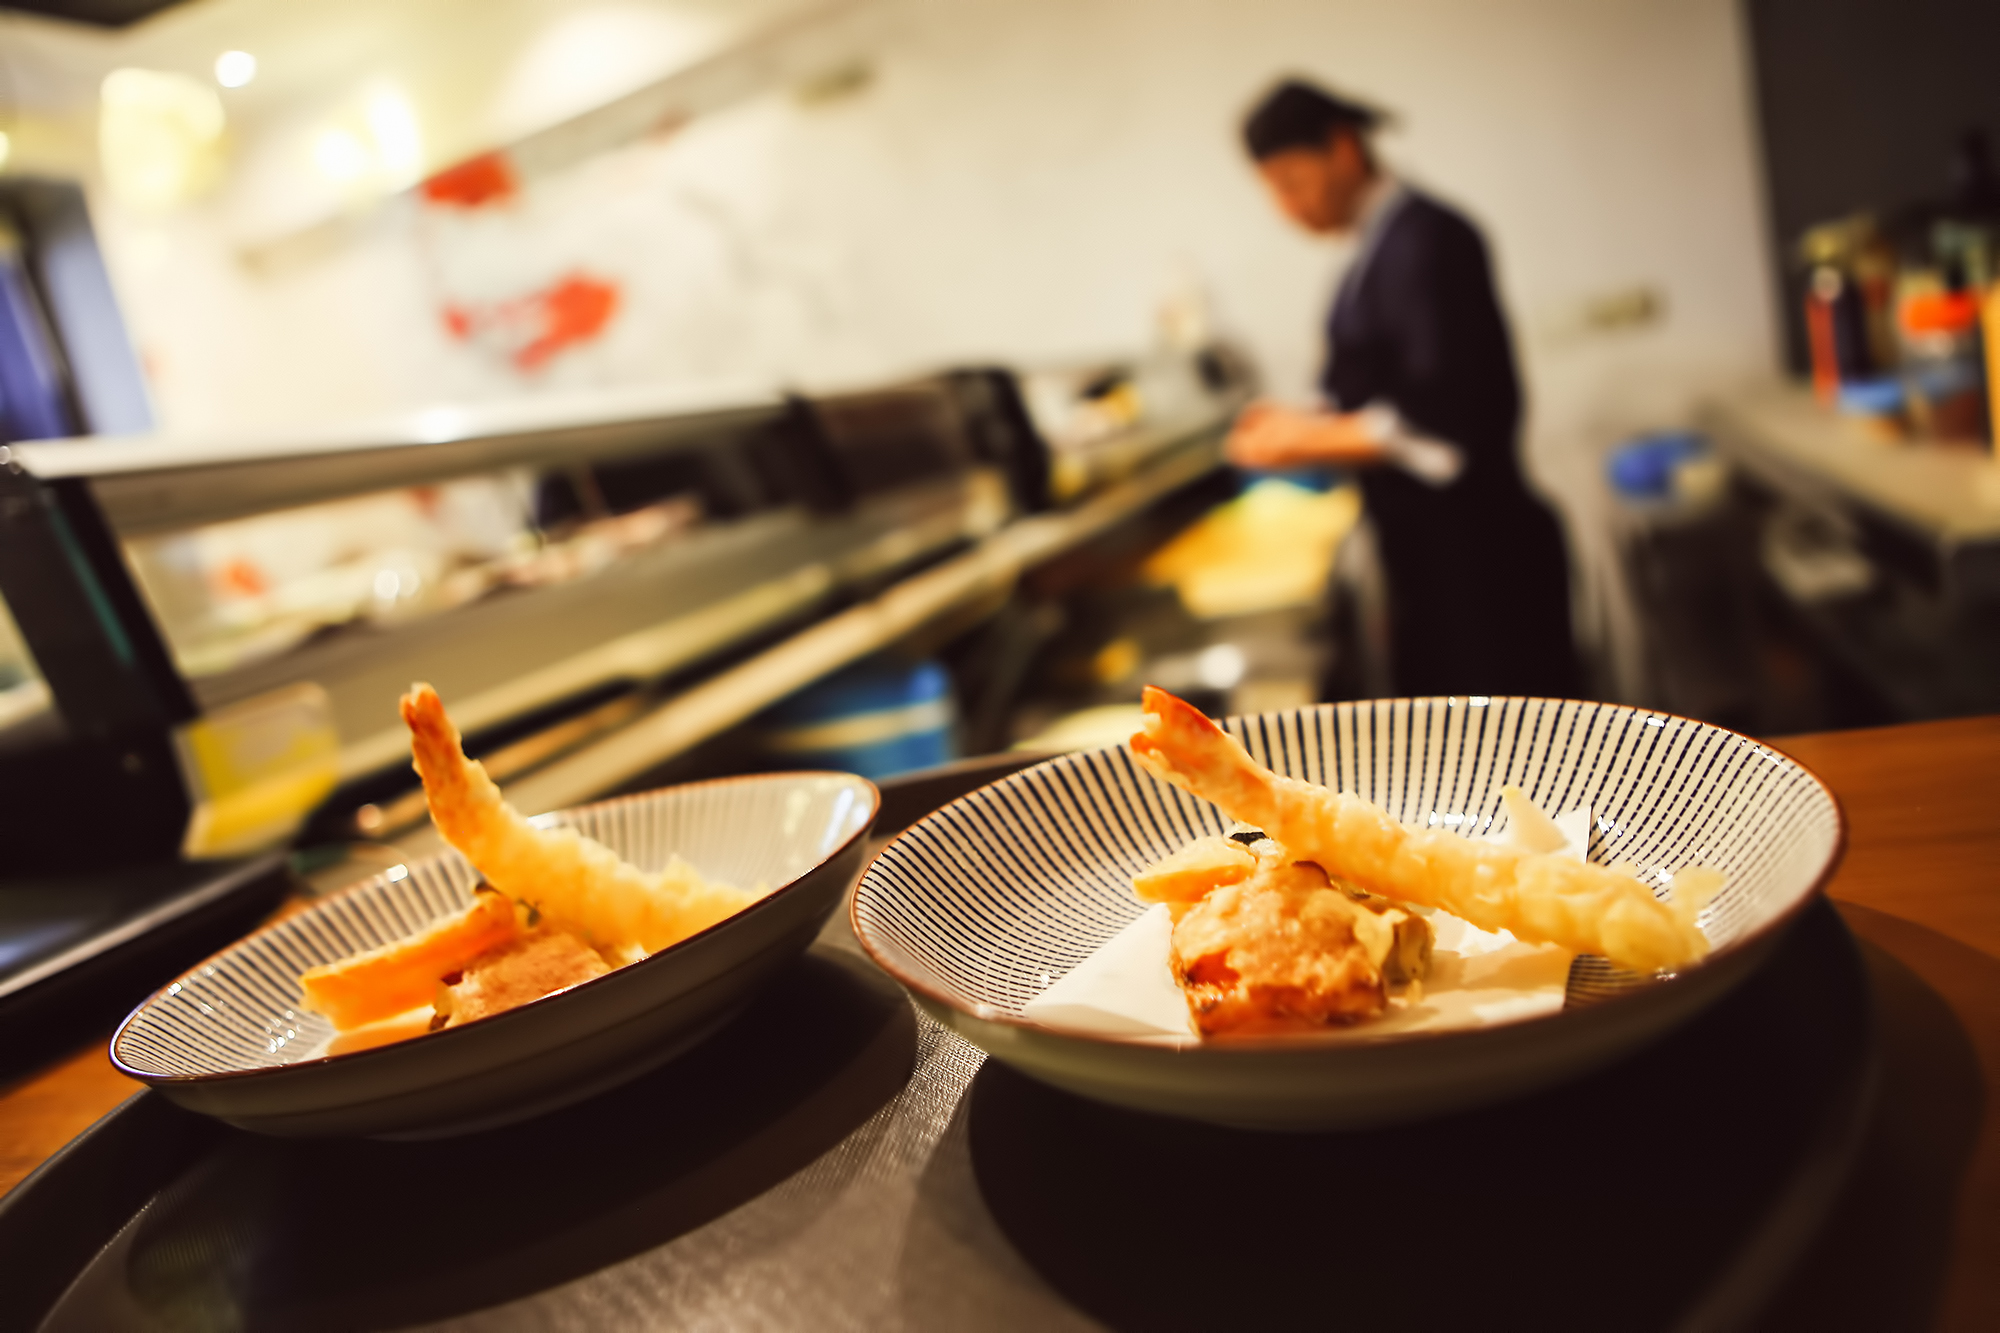 Ikigai restaurante japones en el centro de madrid - Restaurante Ikigai